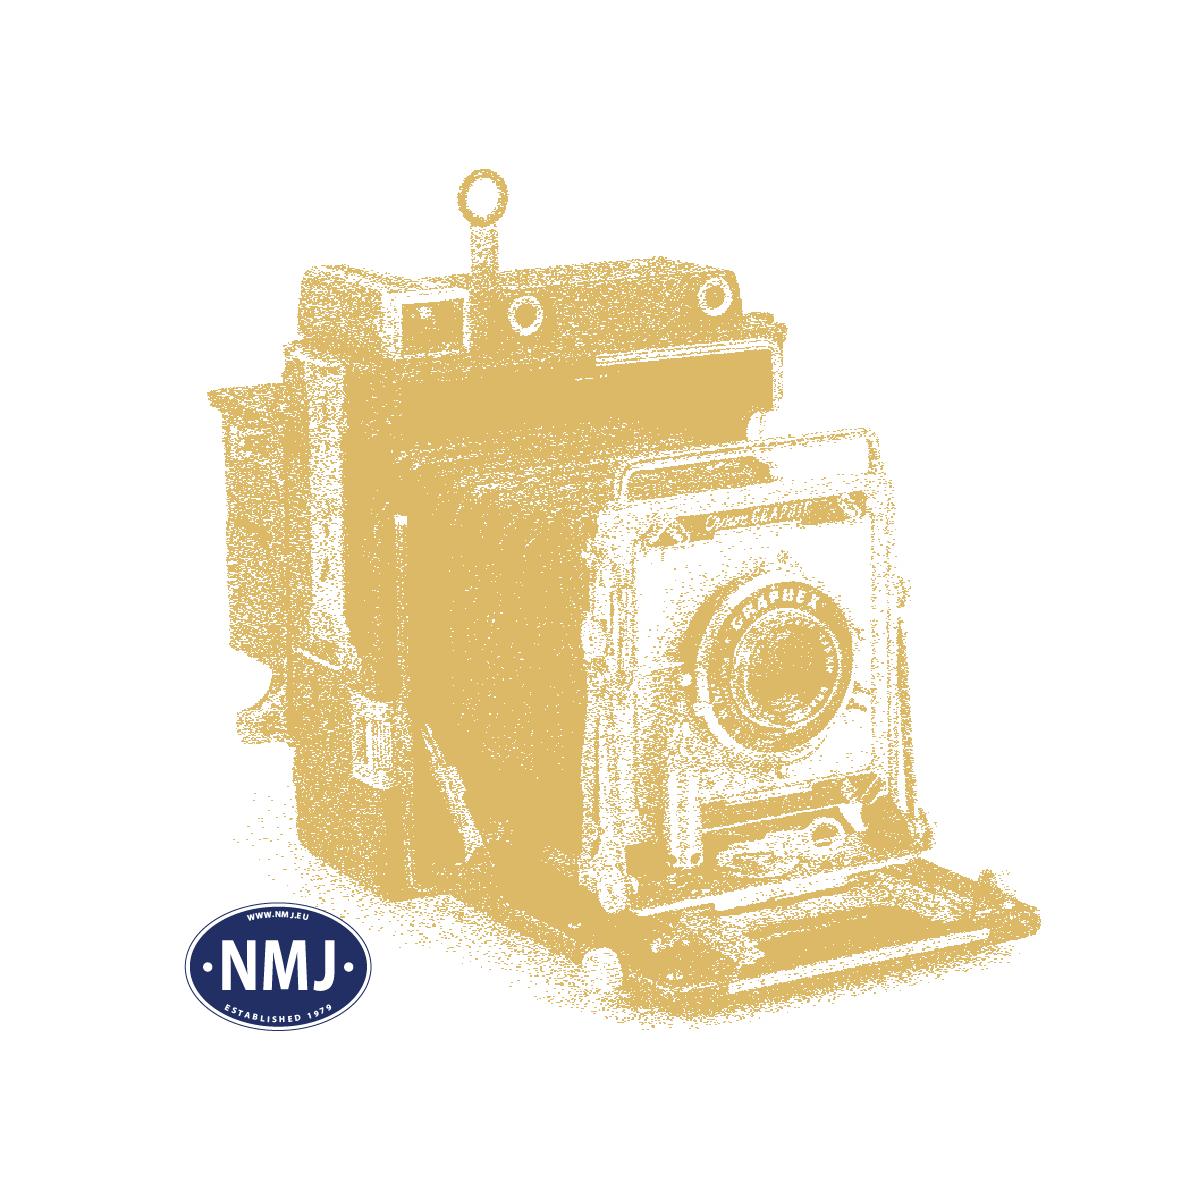 ROC10820 - Z21 Digitalsentral